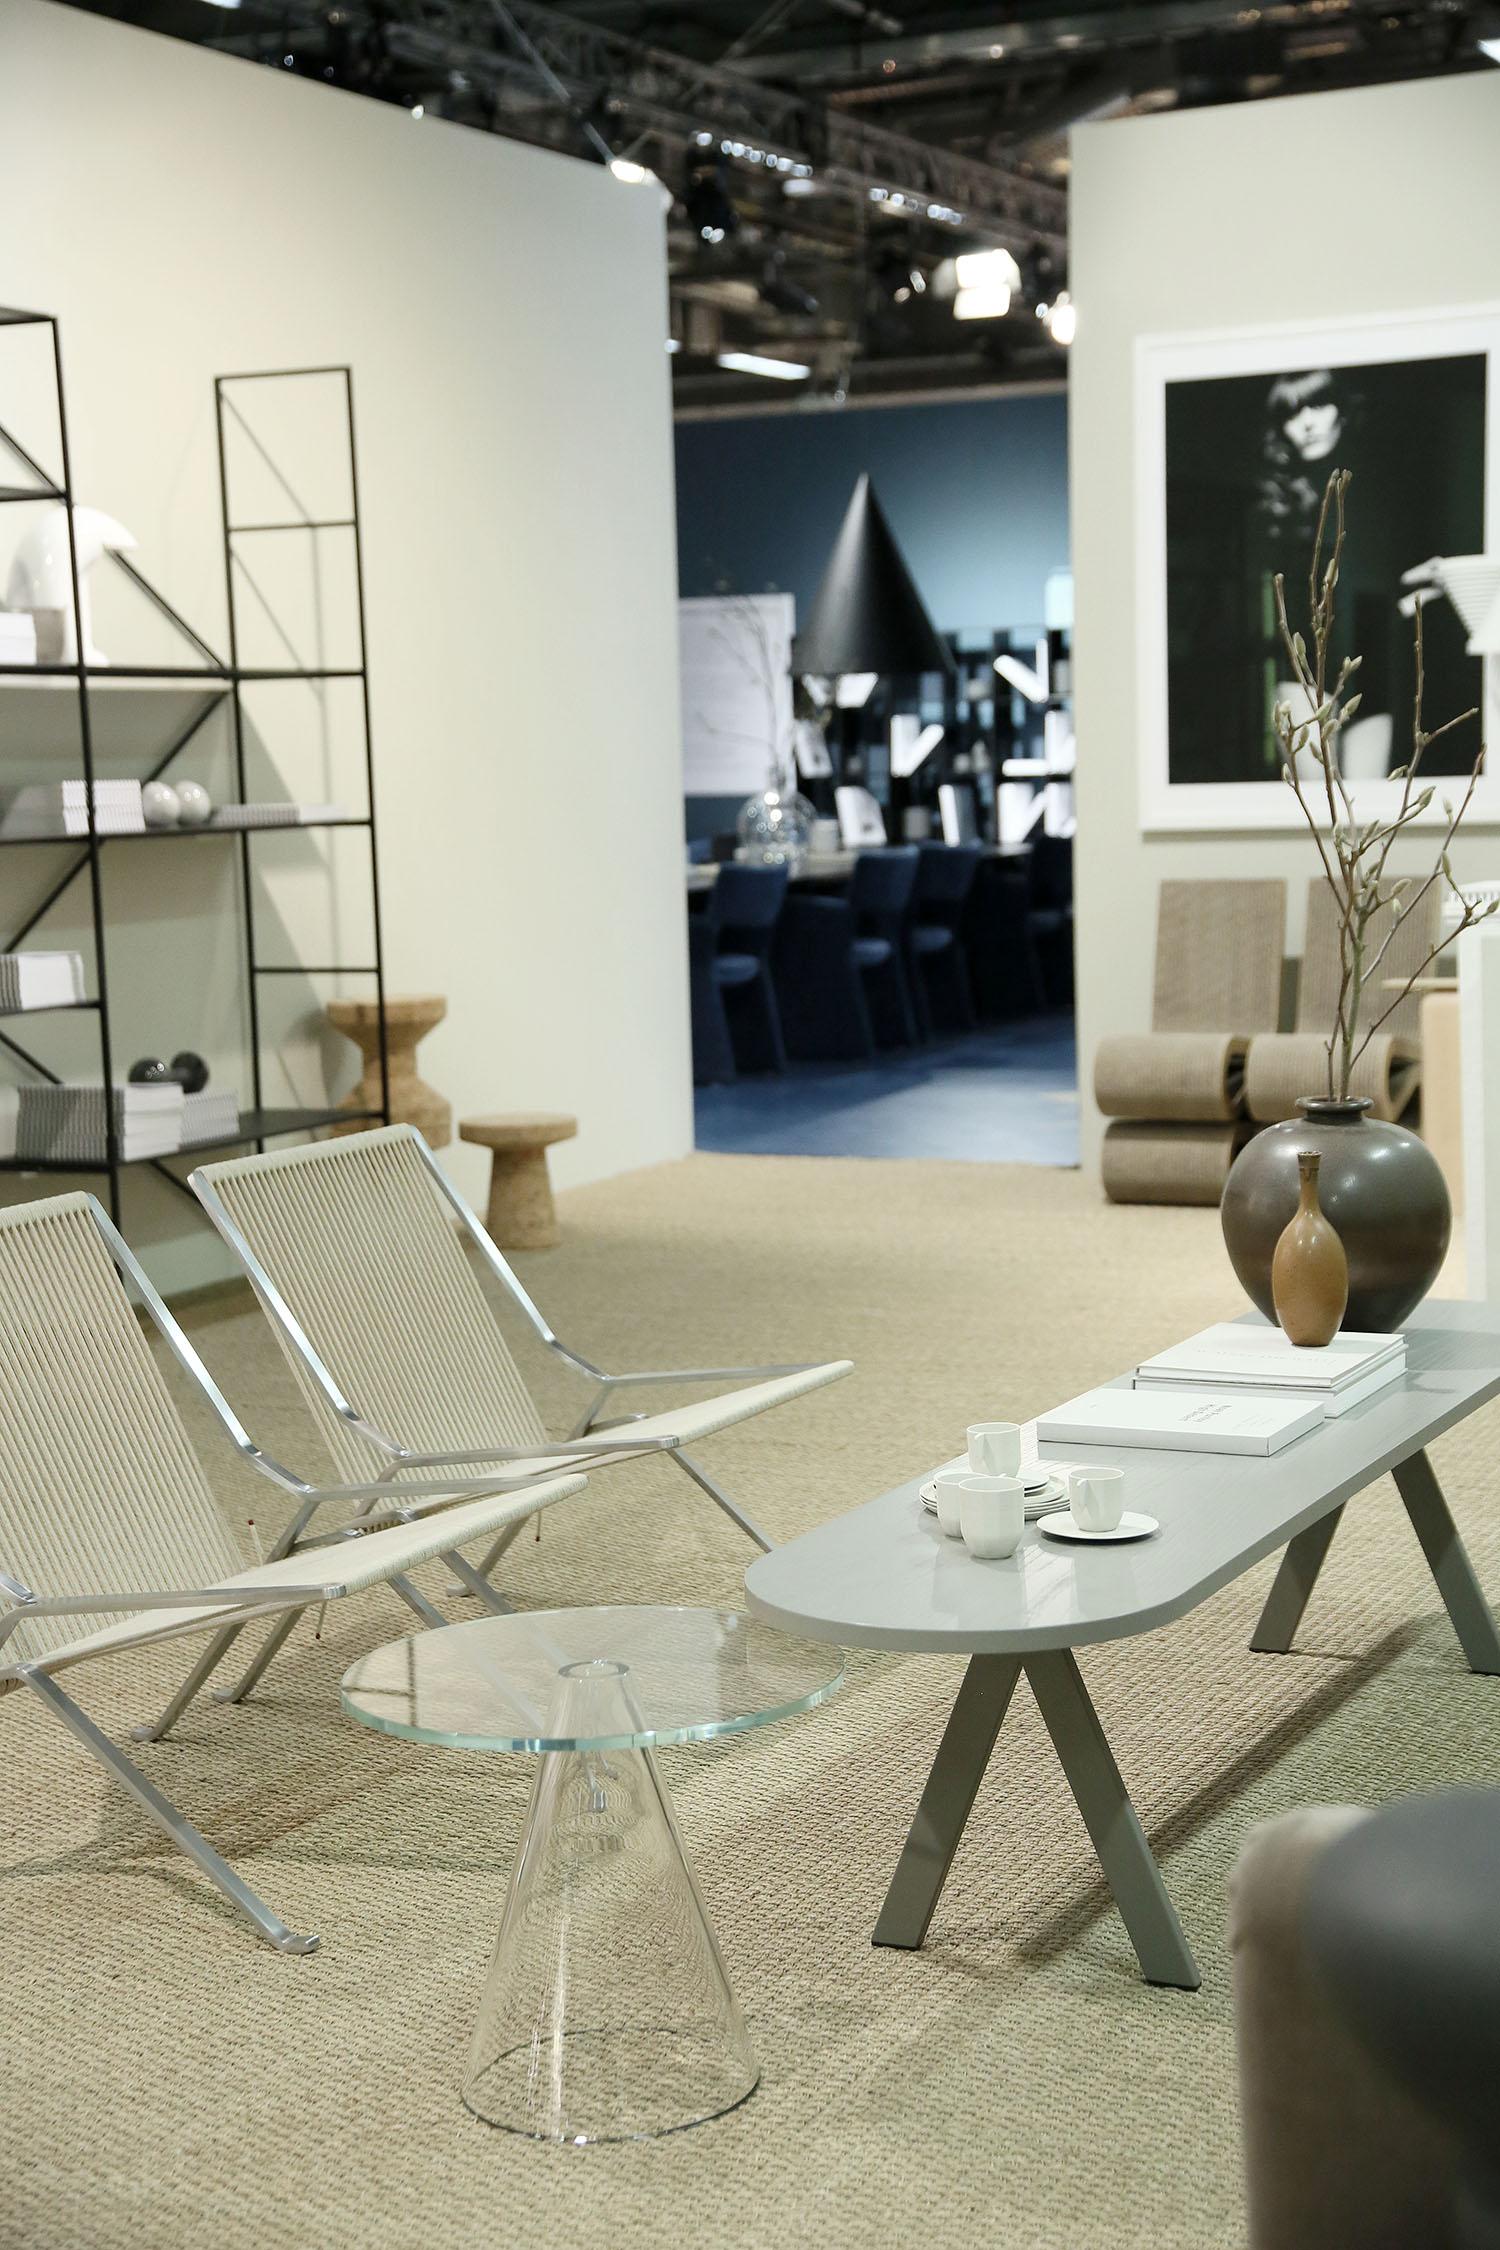 Contrasts by Lotta Agaton Trend Exhibition - fixaodona.se